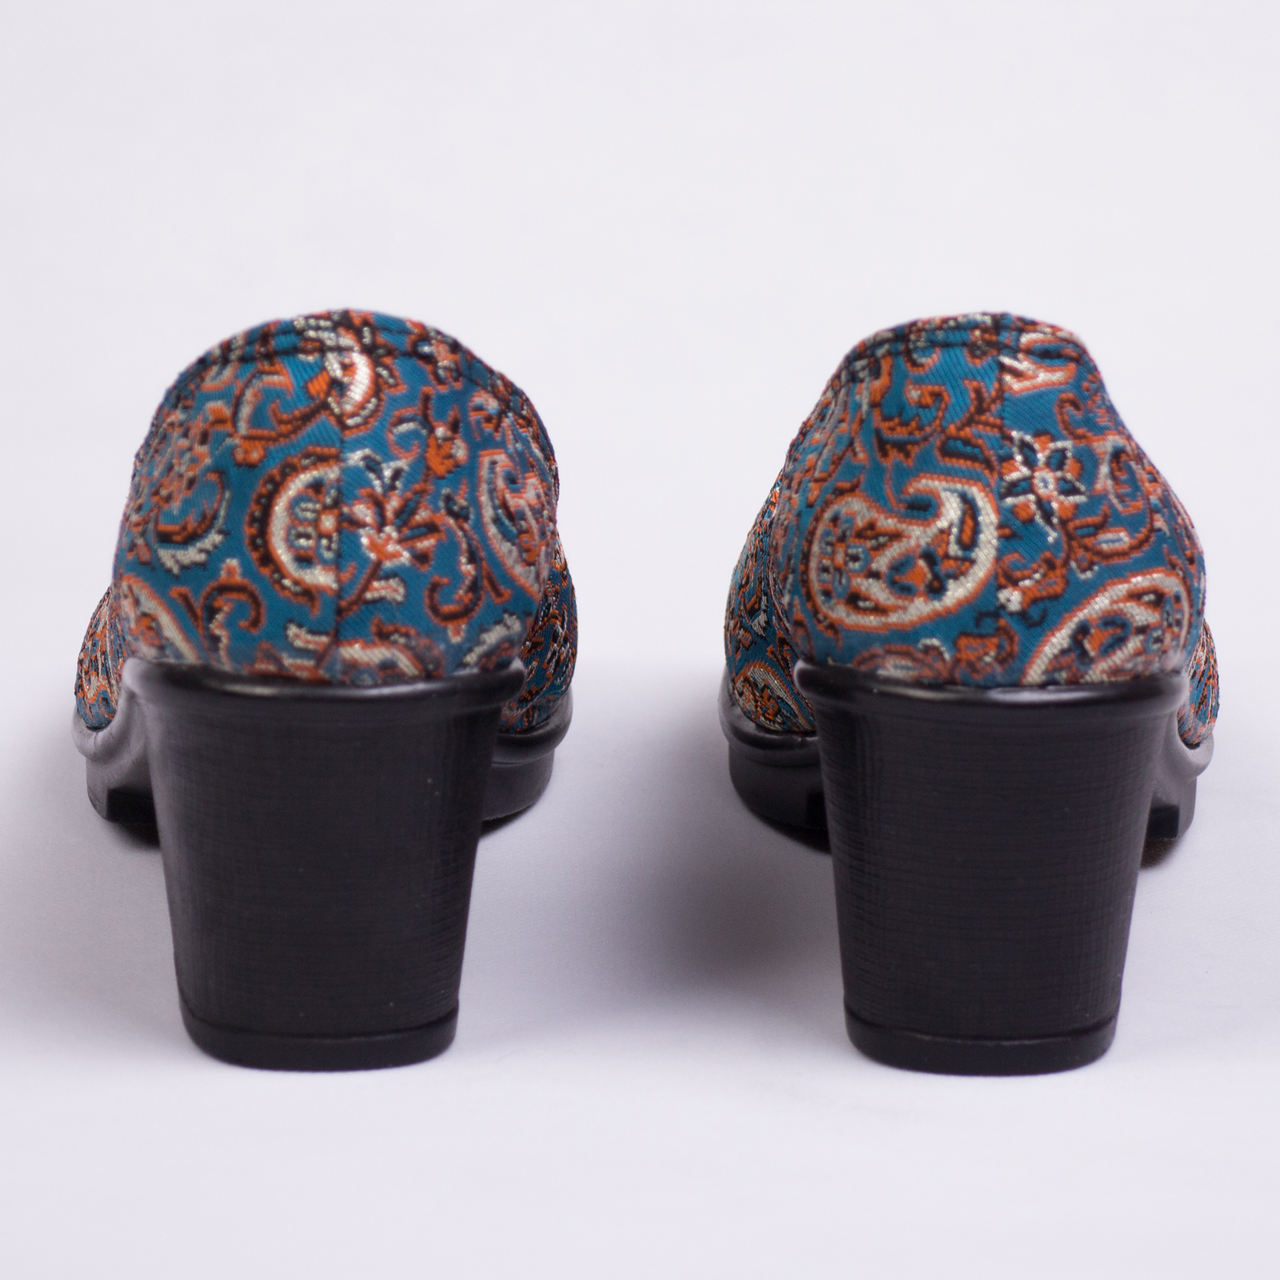 کفش زنانه کد TS-5 -  - 2